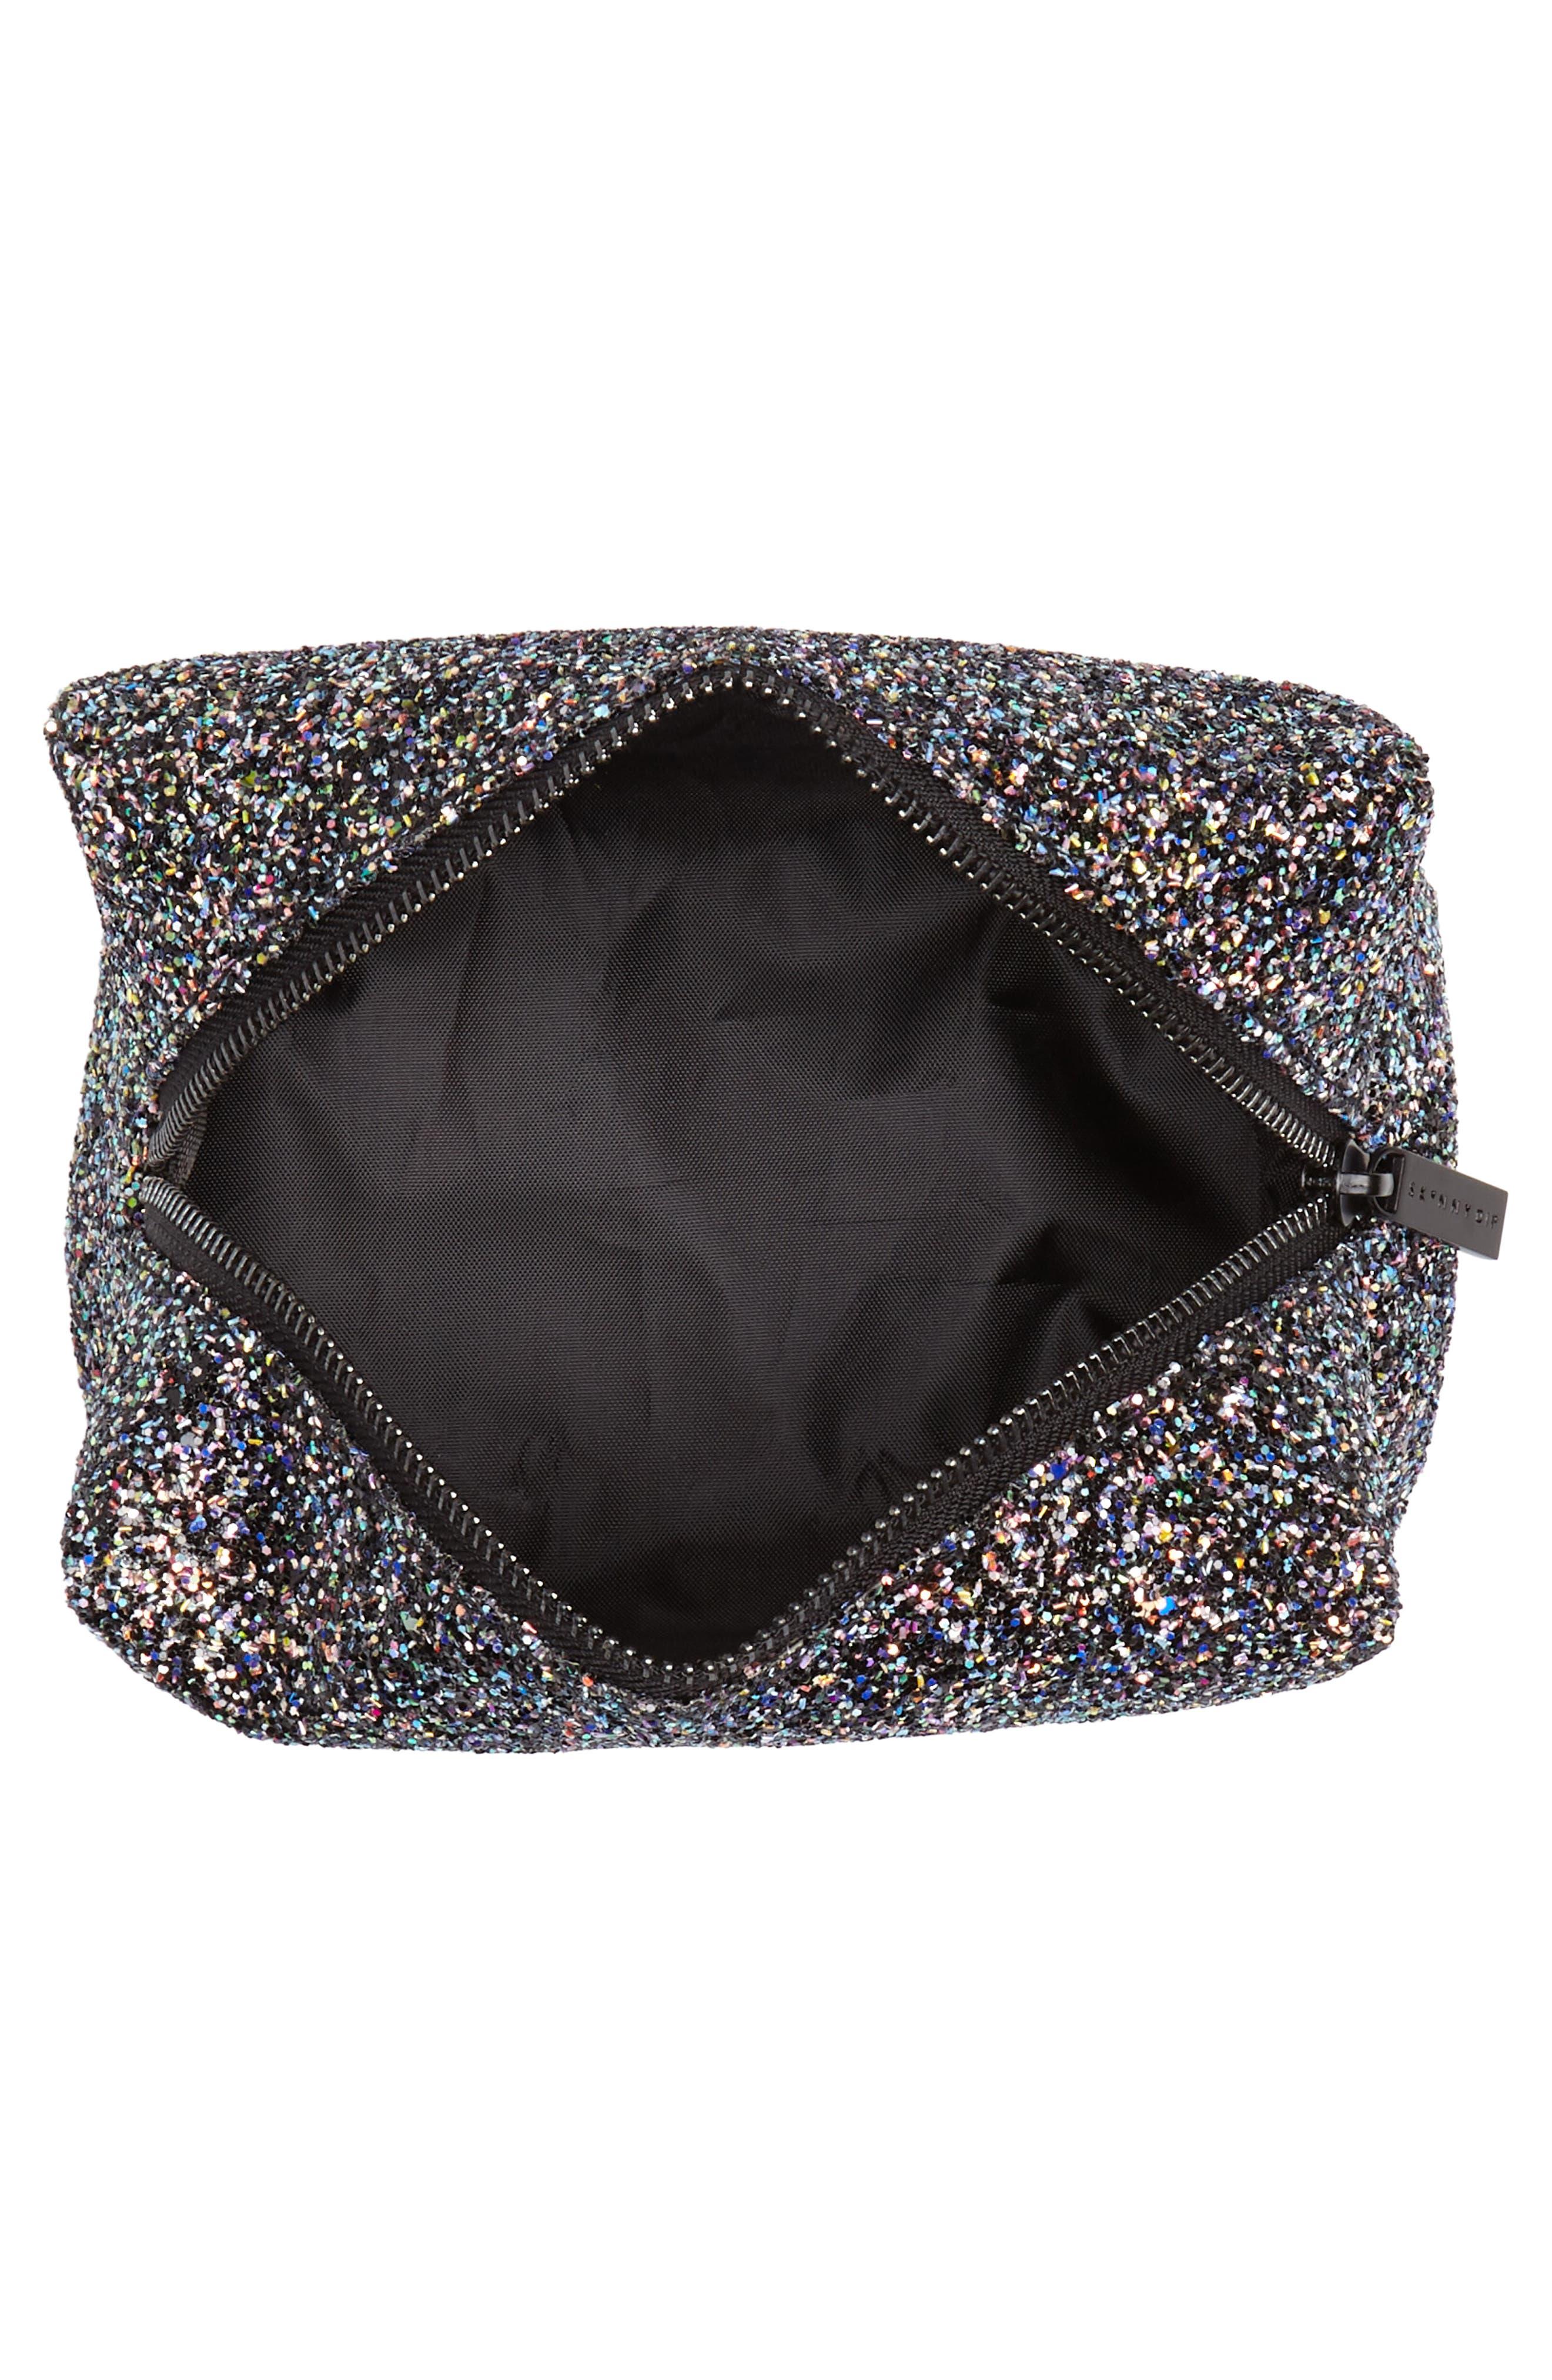 Skinny Dip Liquorice Glitter Cosmetics Bag,                             Alternate thumbnail 3, color,                             000